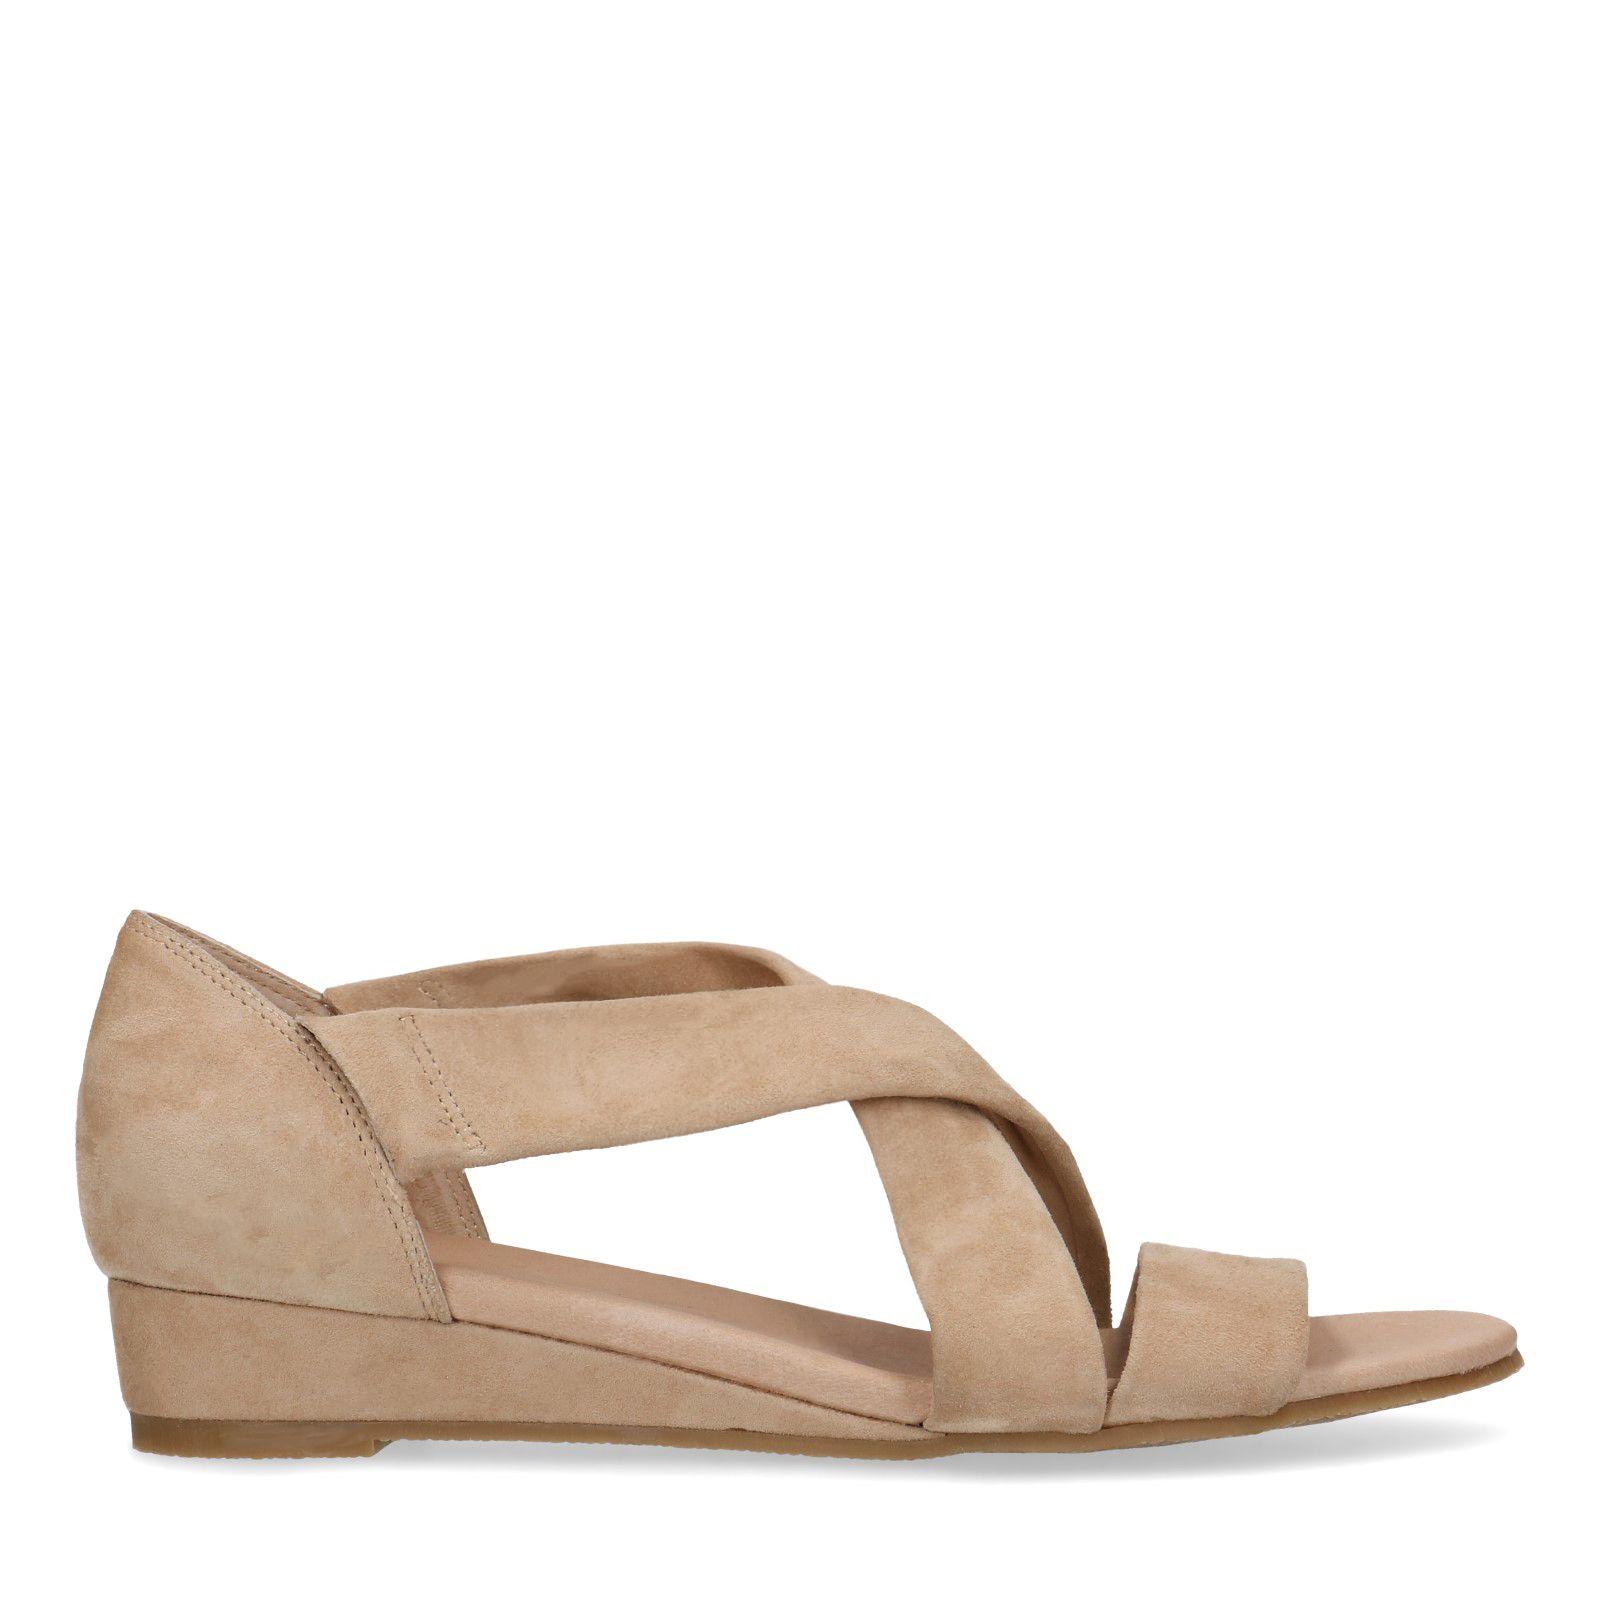 Taupe sandalen met sleehak